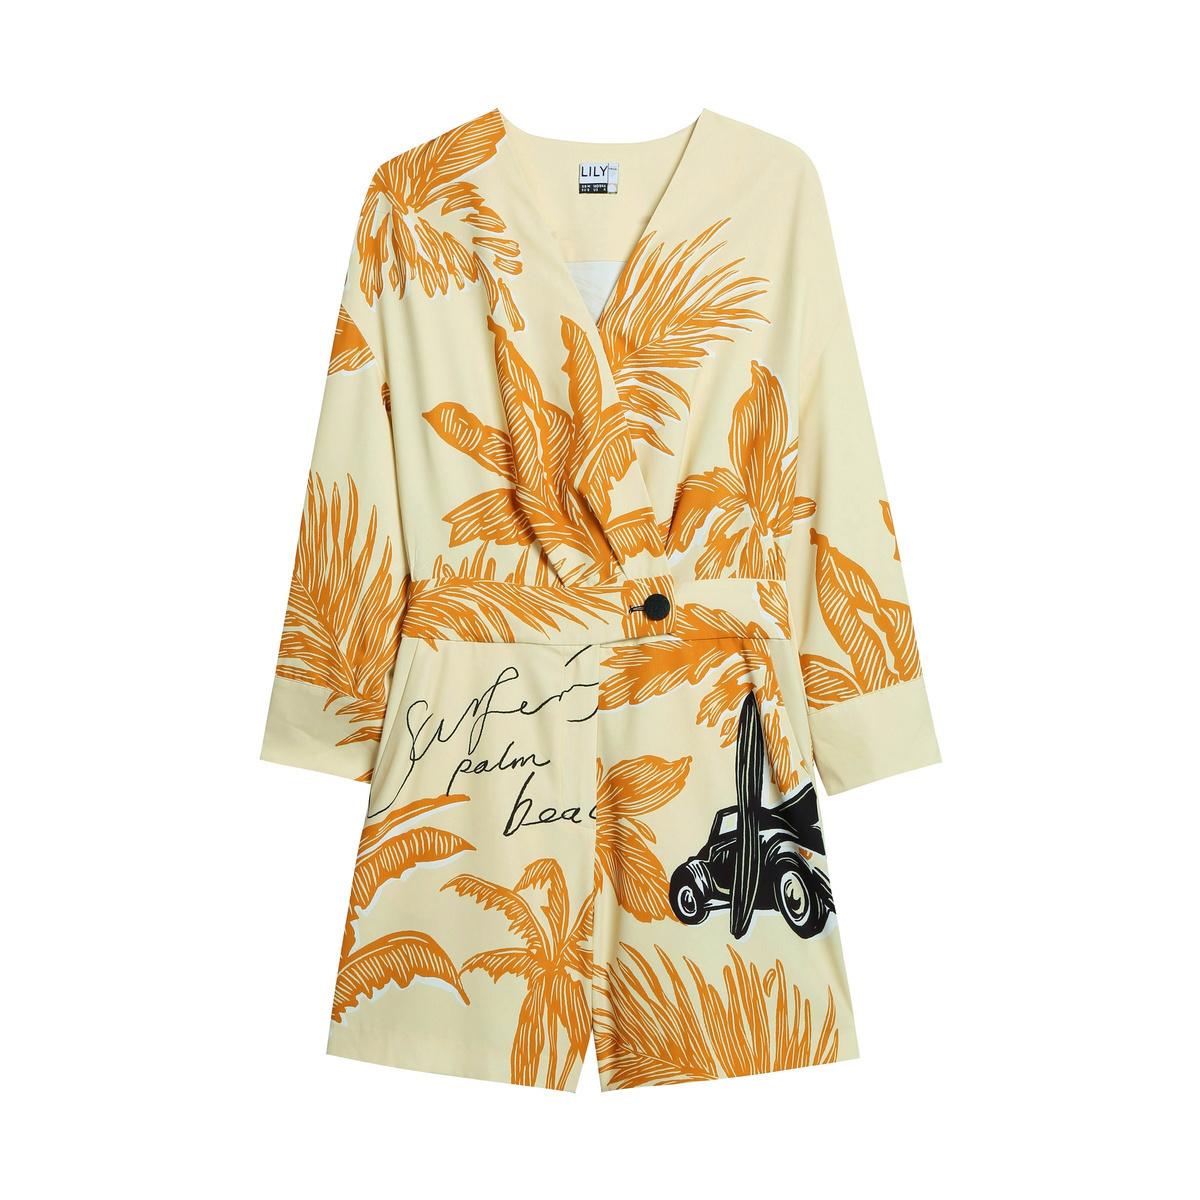 LILY夏季新款女装沙滩度假风印花收腰显瘦V领休闲短裤连体裤